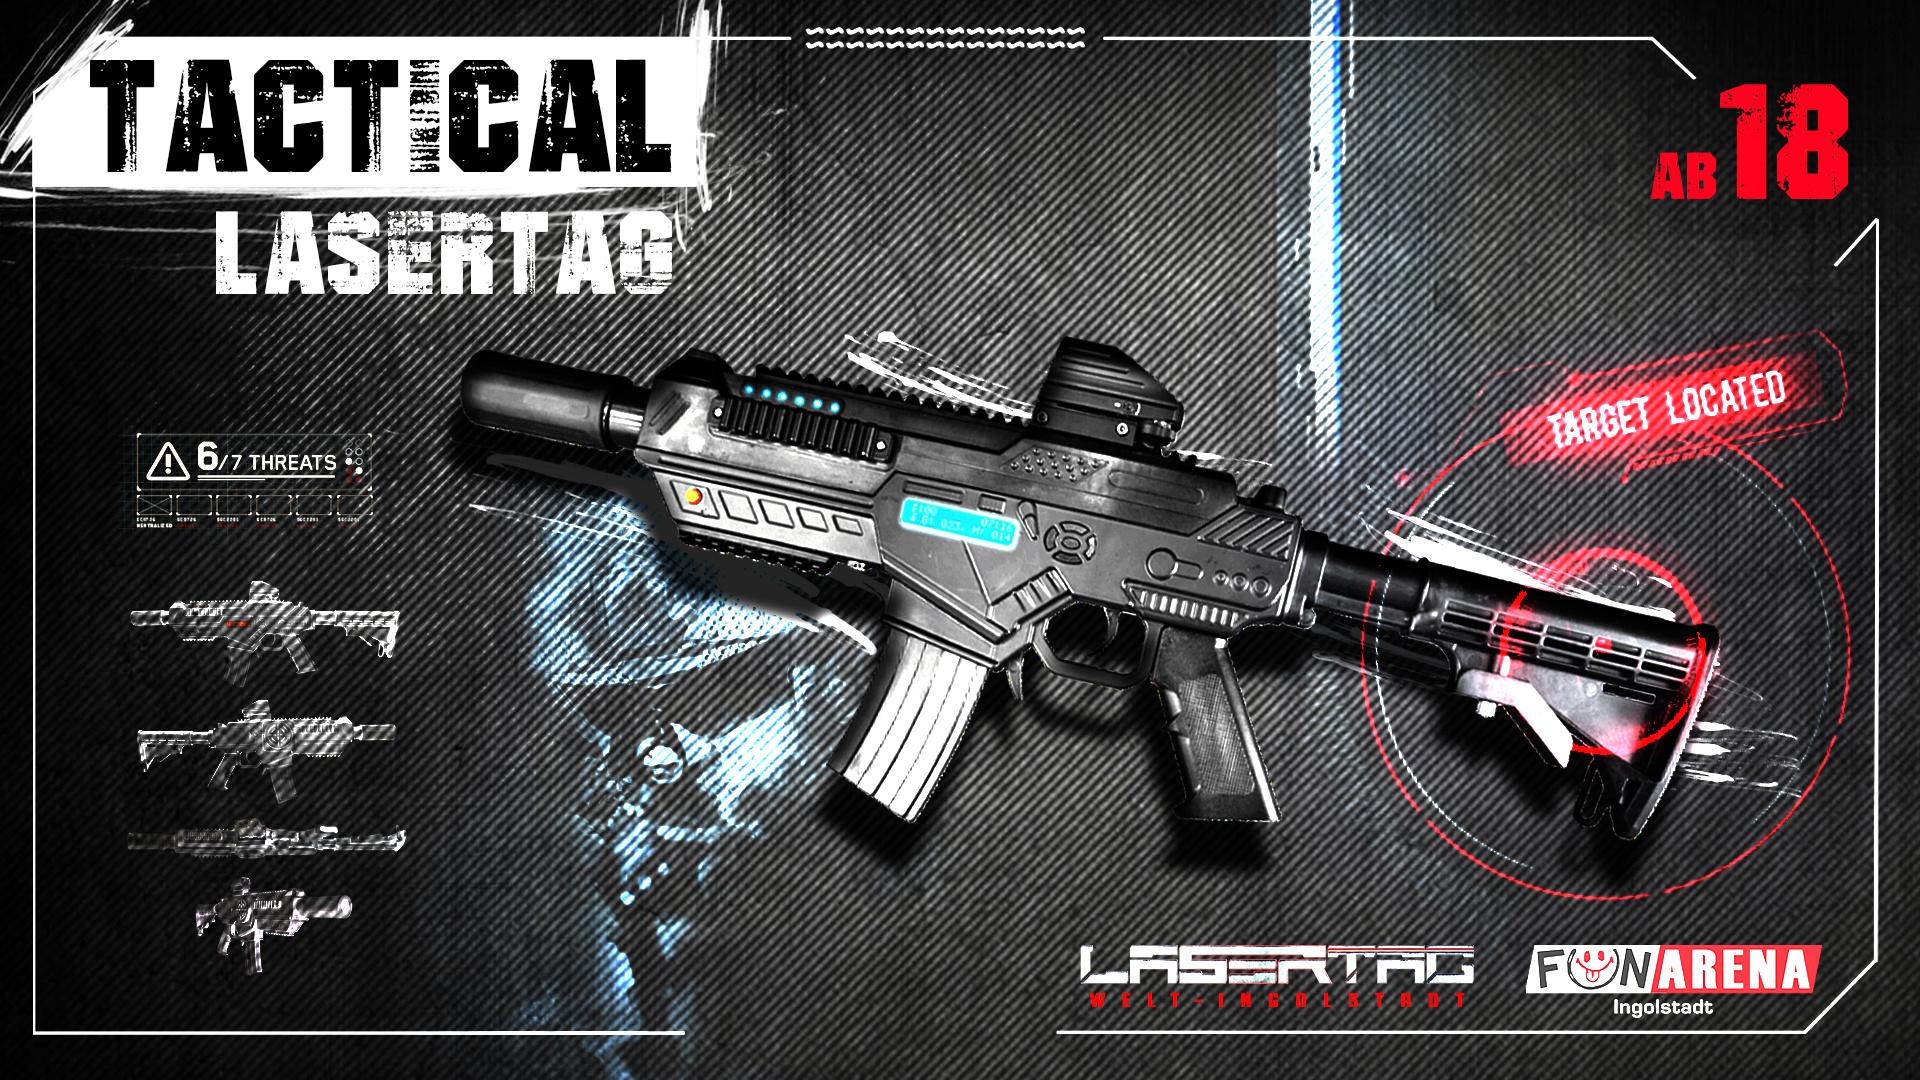 Tactical Lasertag Ingolstadt